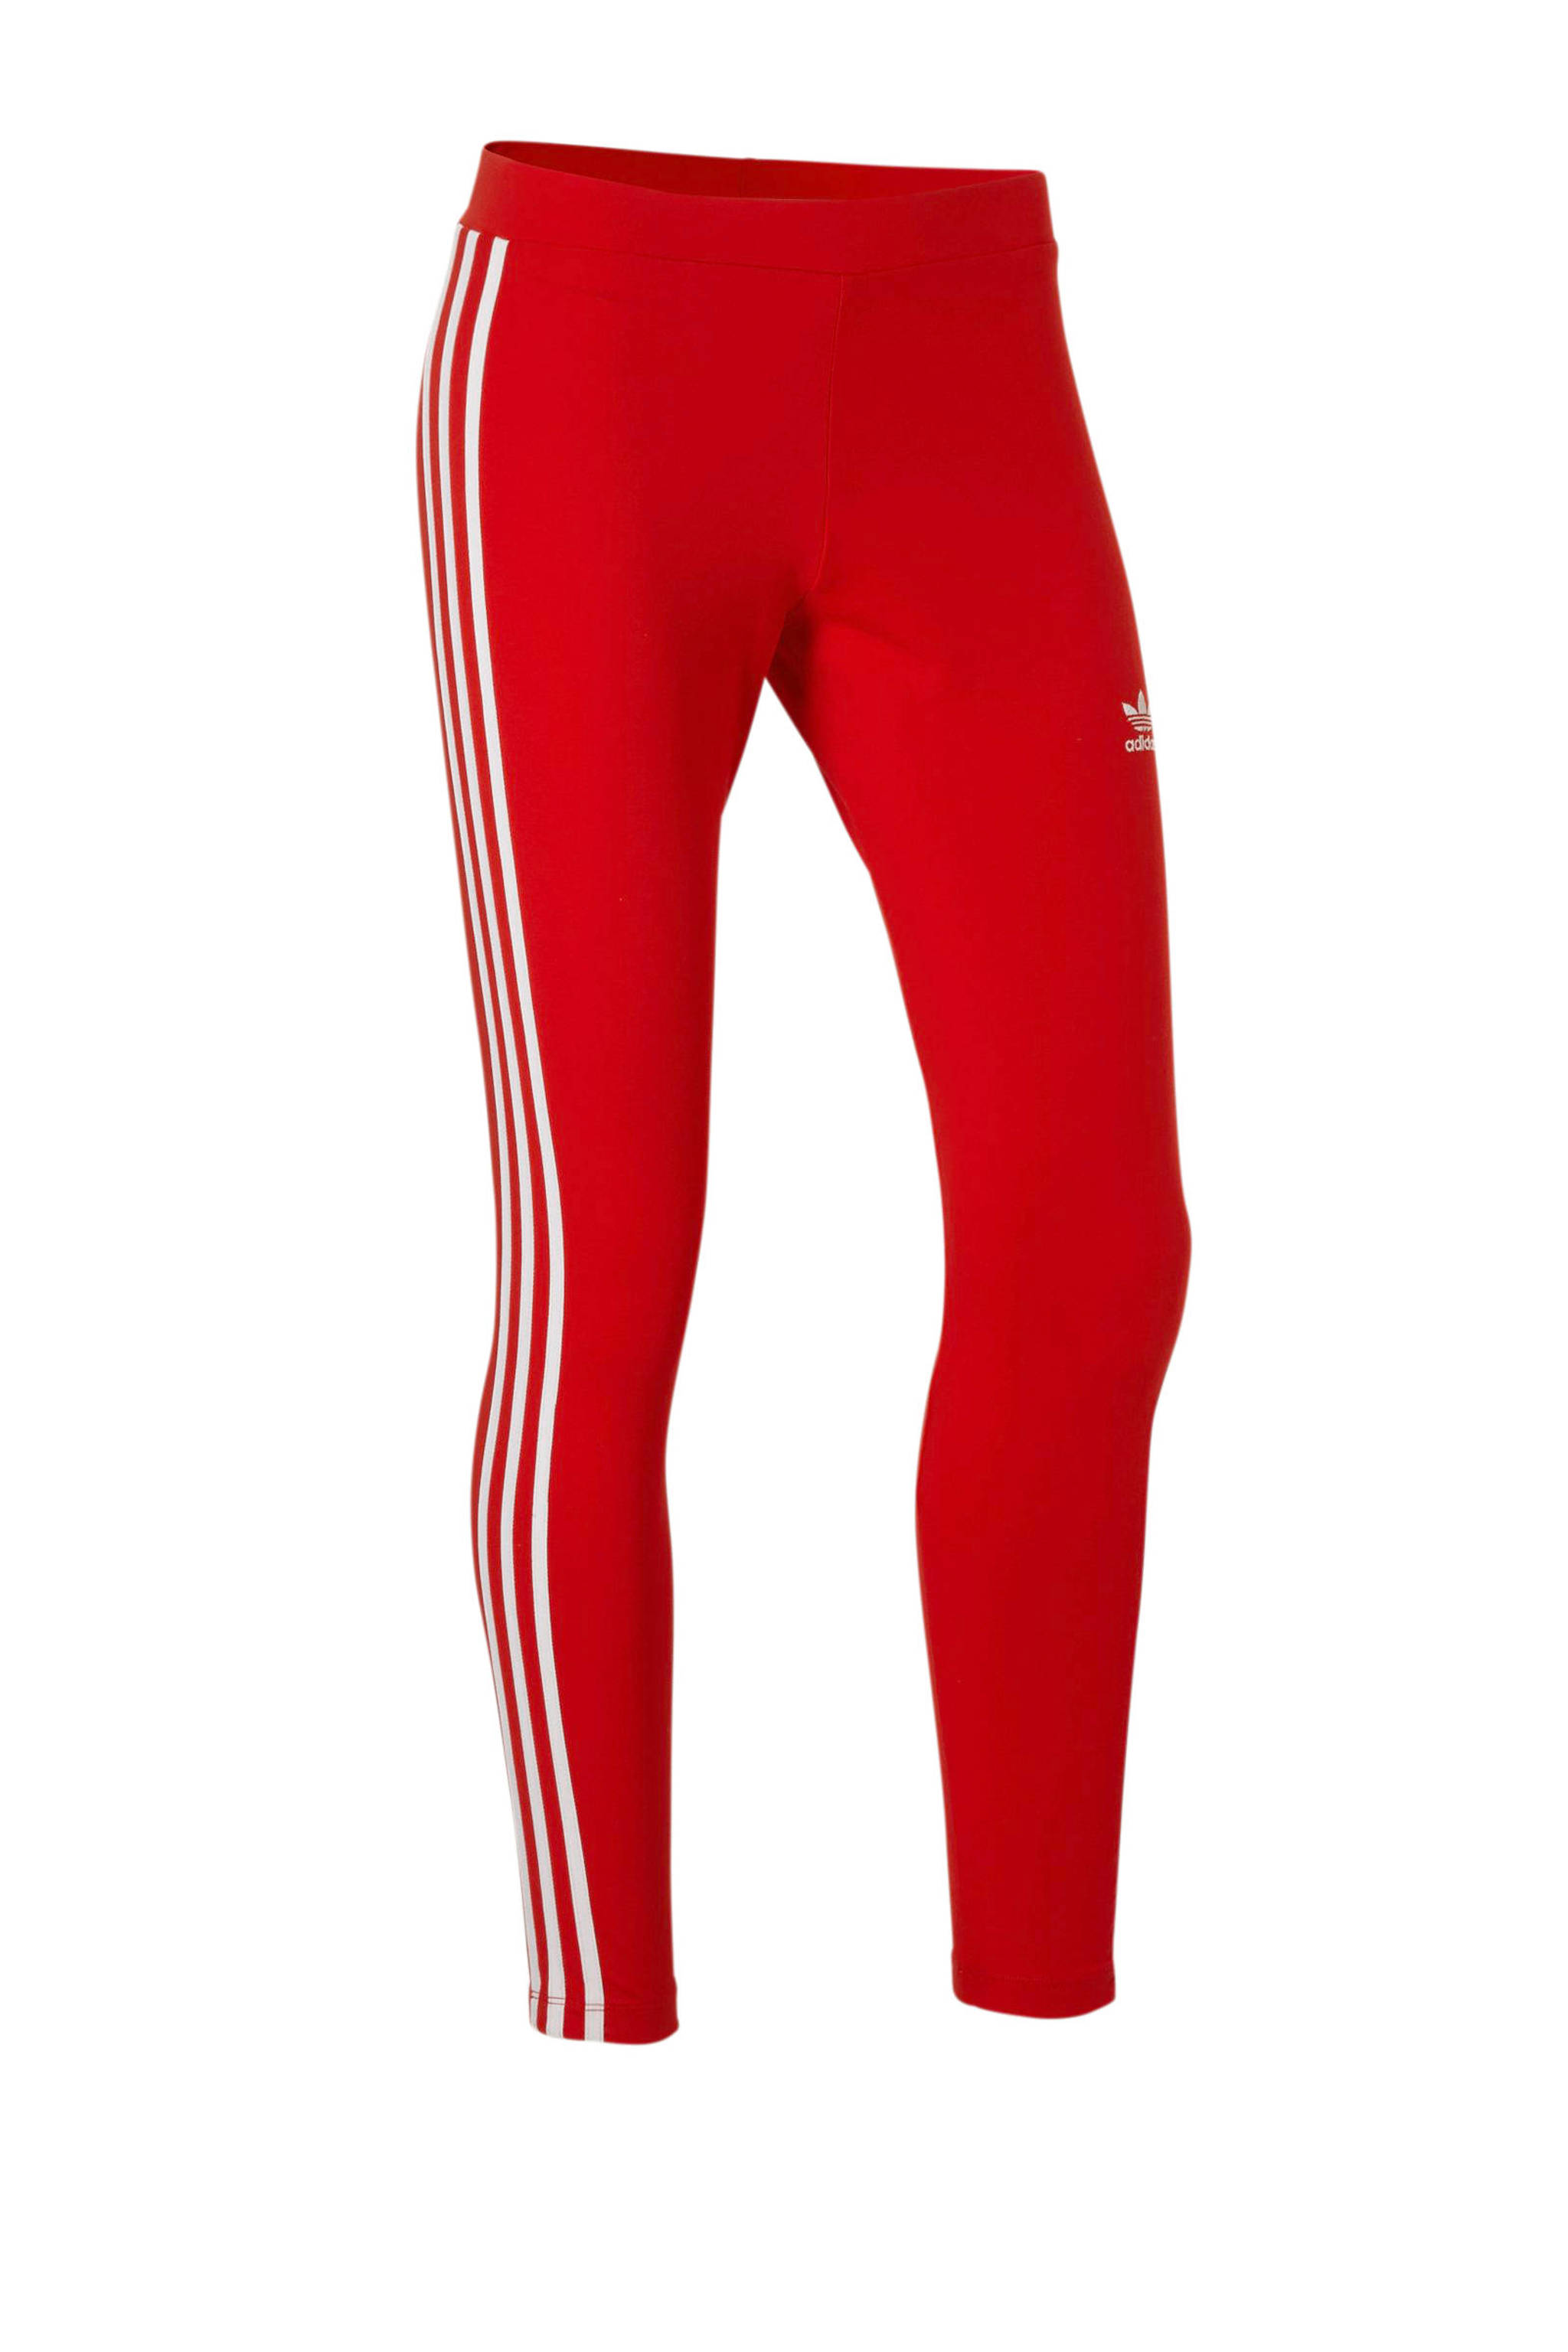 Sportlegging Rood.Adidas Originals 7 8 Sportlegging Rood Wehkamp